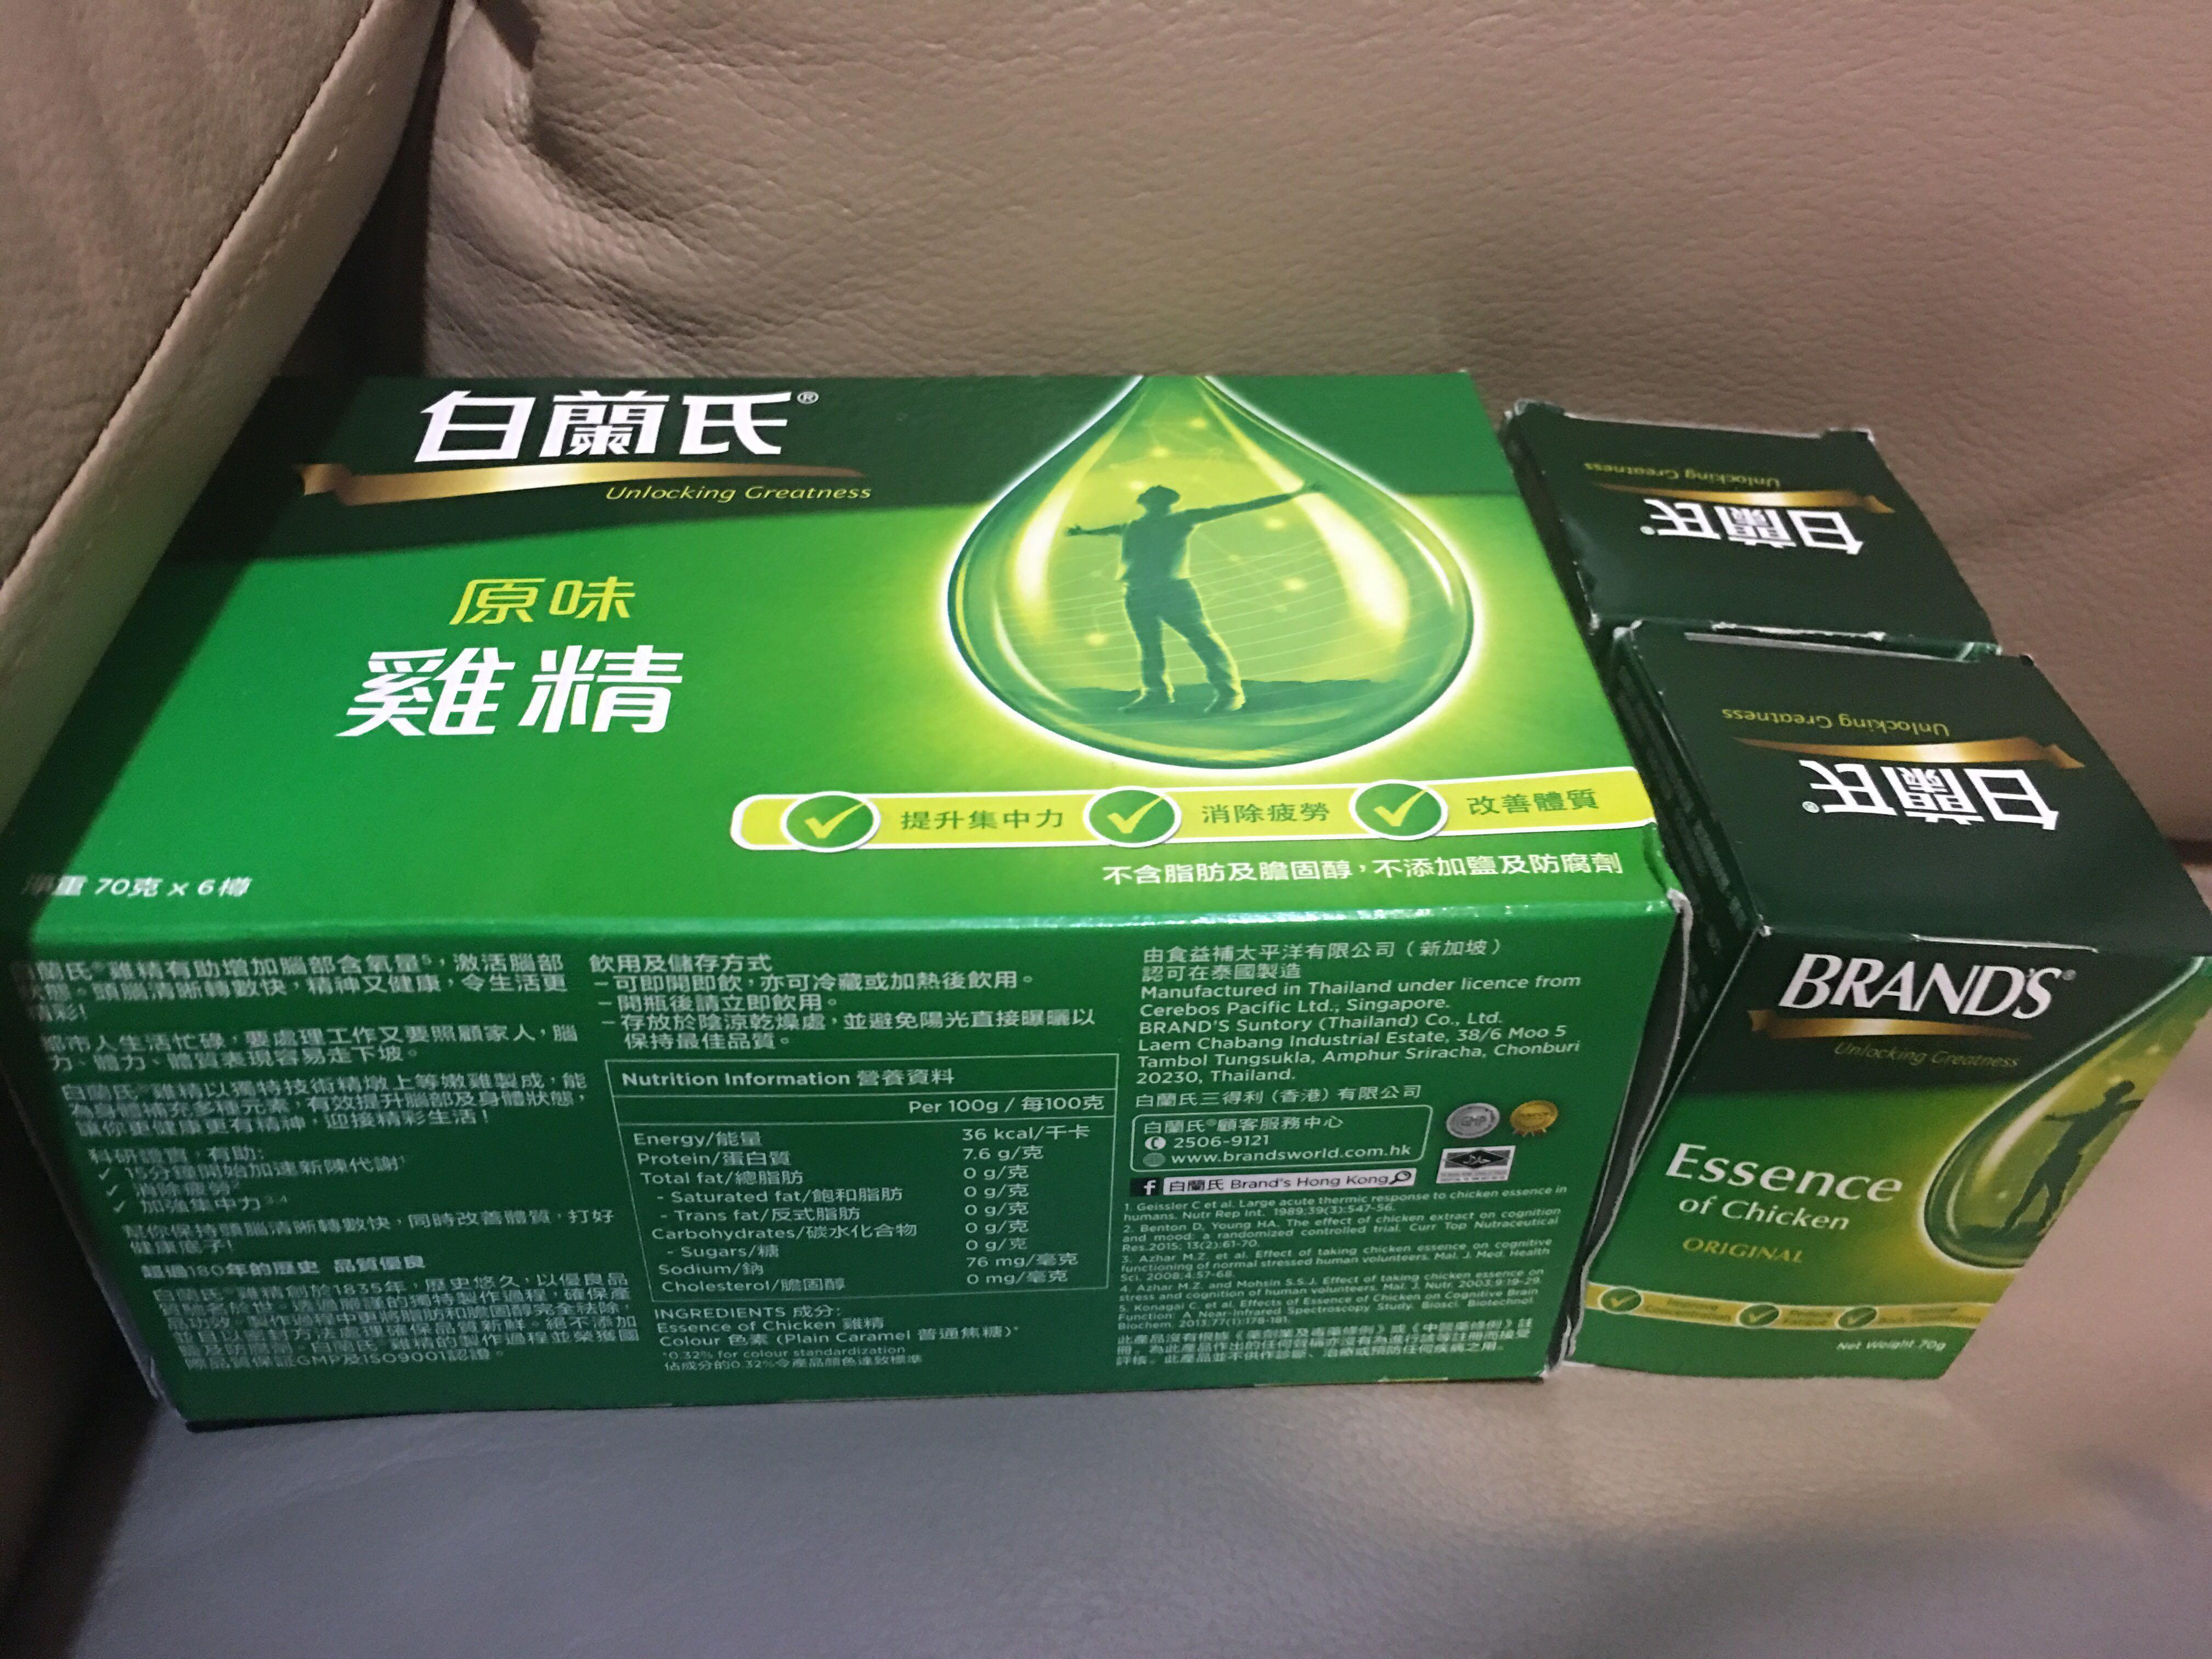 白蘭氏雞精 Brands essence of chicken original flavour 6盒裝 另加5支